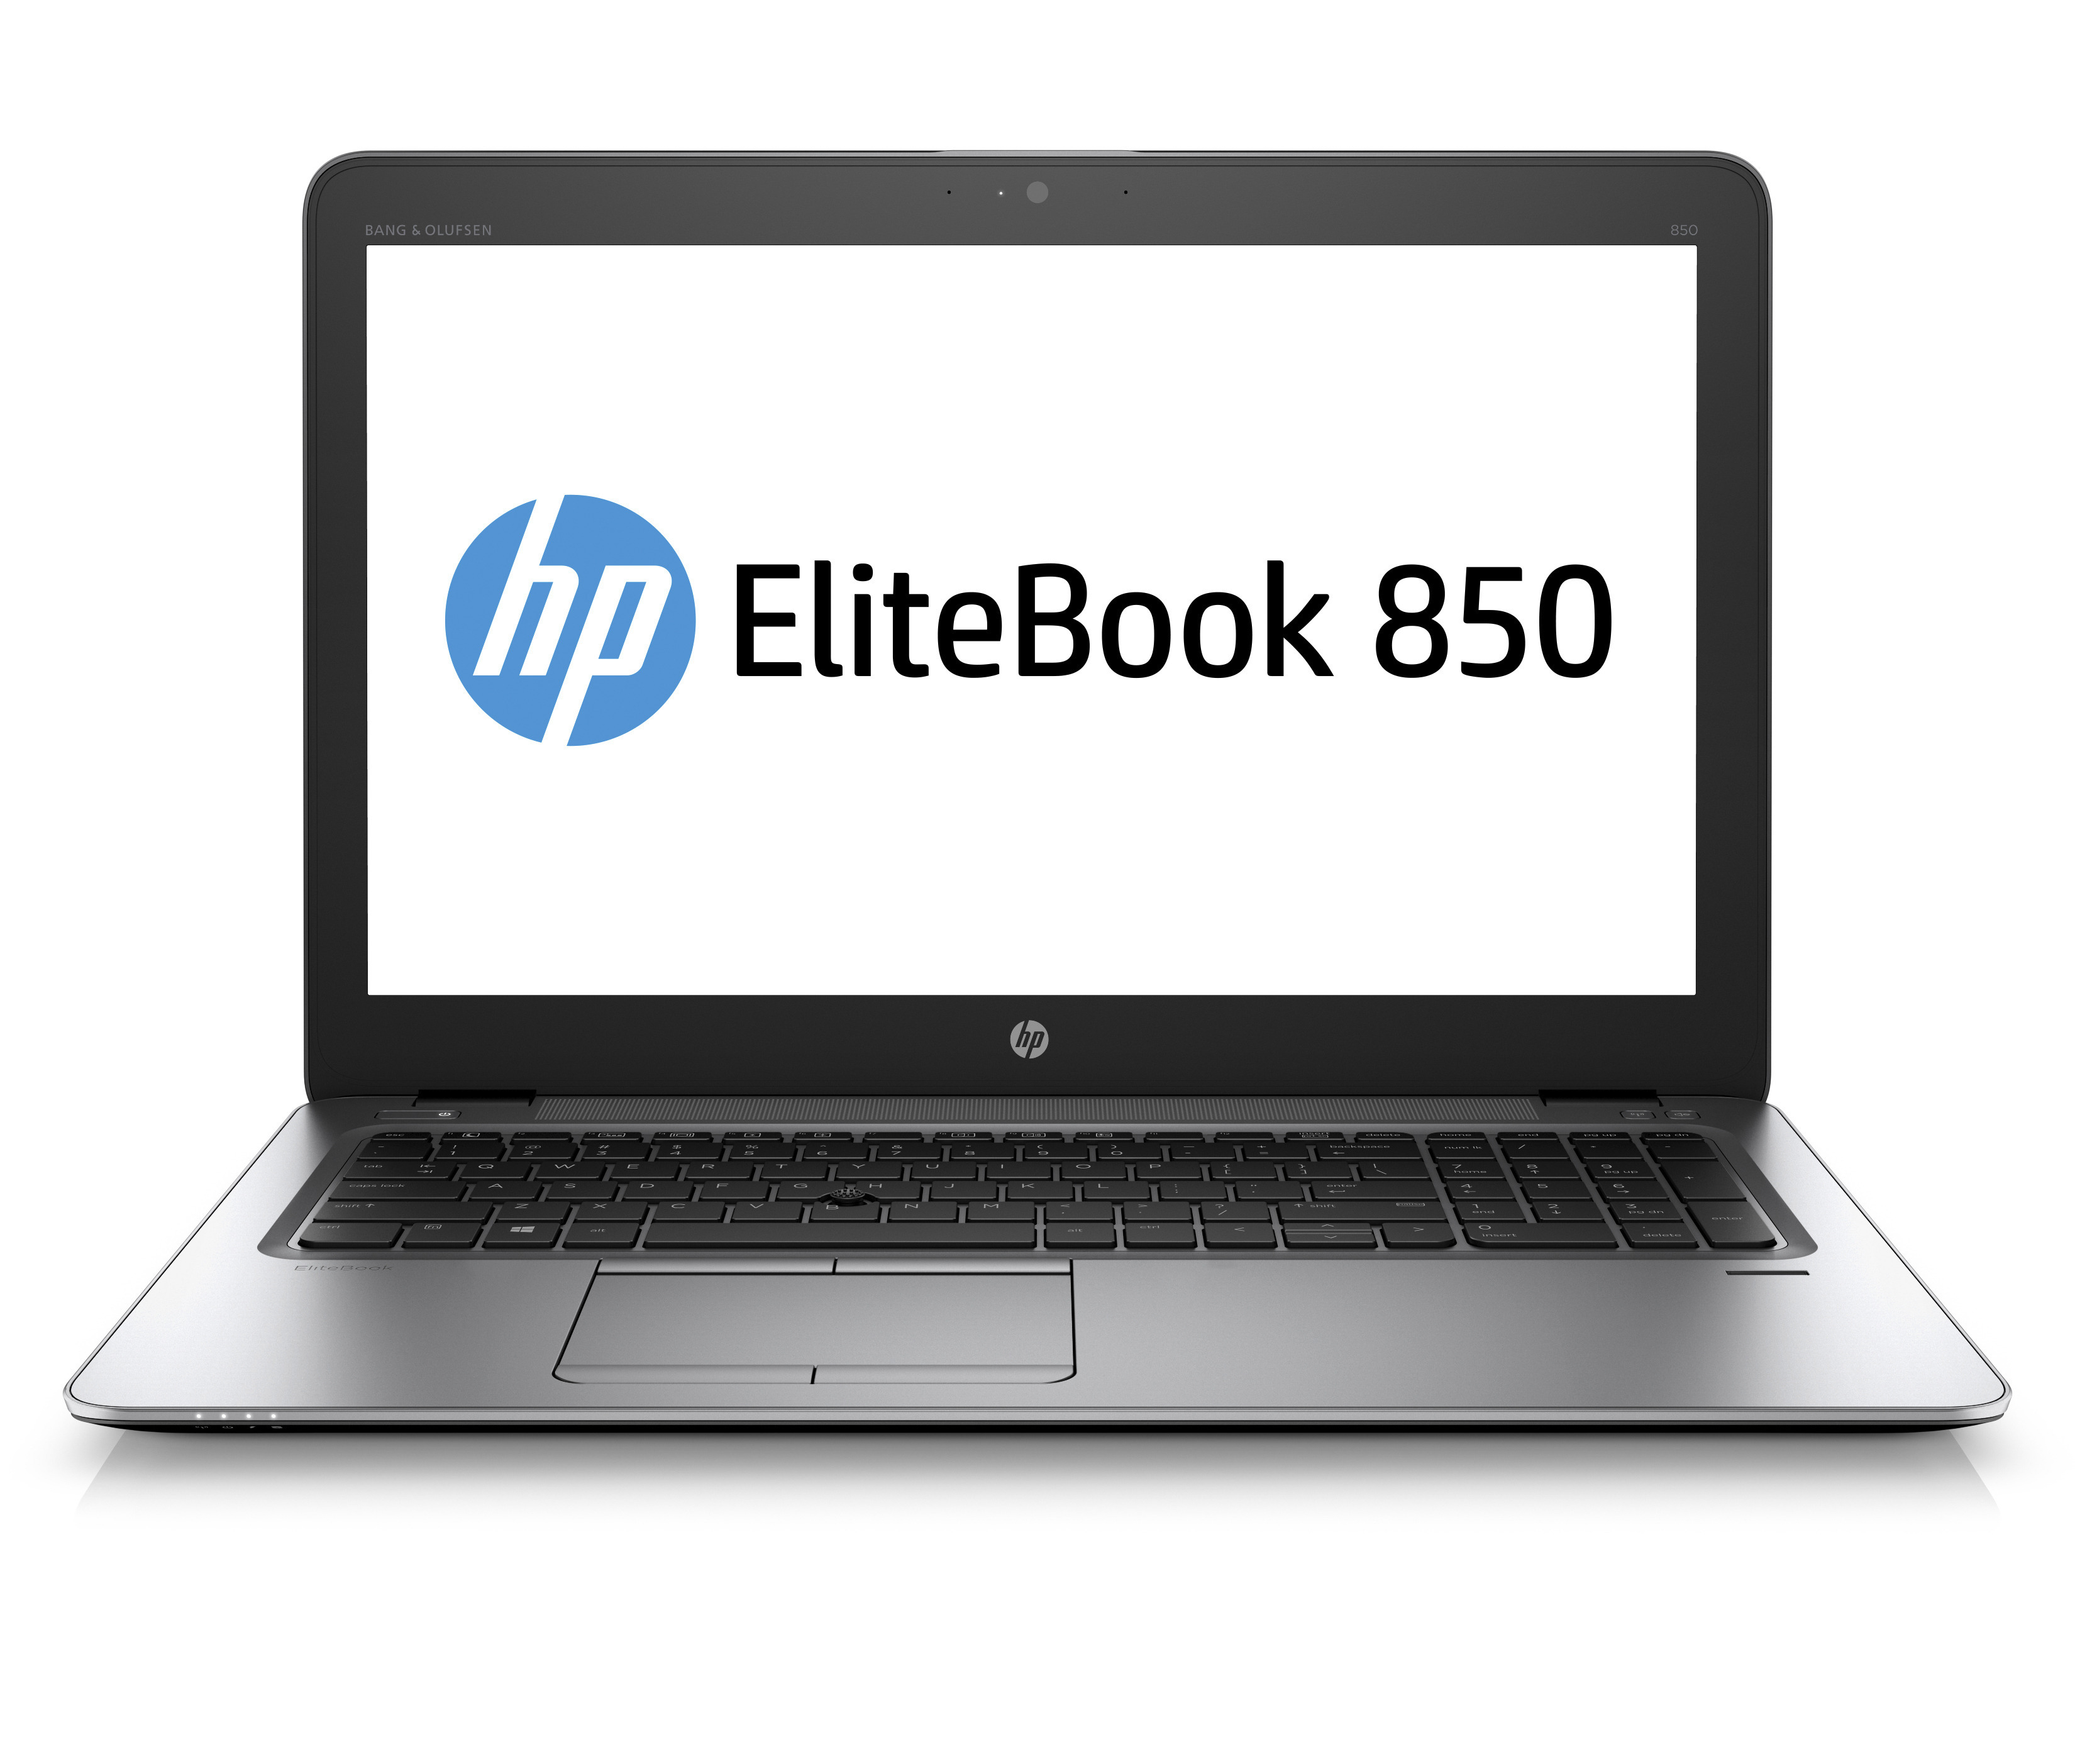 HP - PSG MOBILE (AN) ELITEBOOK 850 G3 I7-6500U 1X16G 1TB+512SSD 15.6UHD W10P         .IT V1C13EA#ABZ